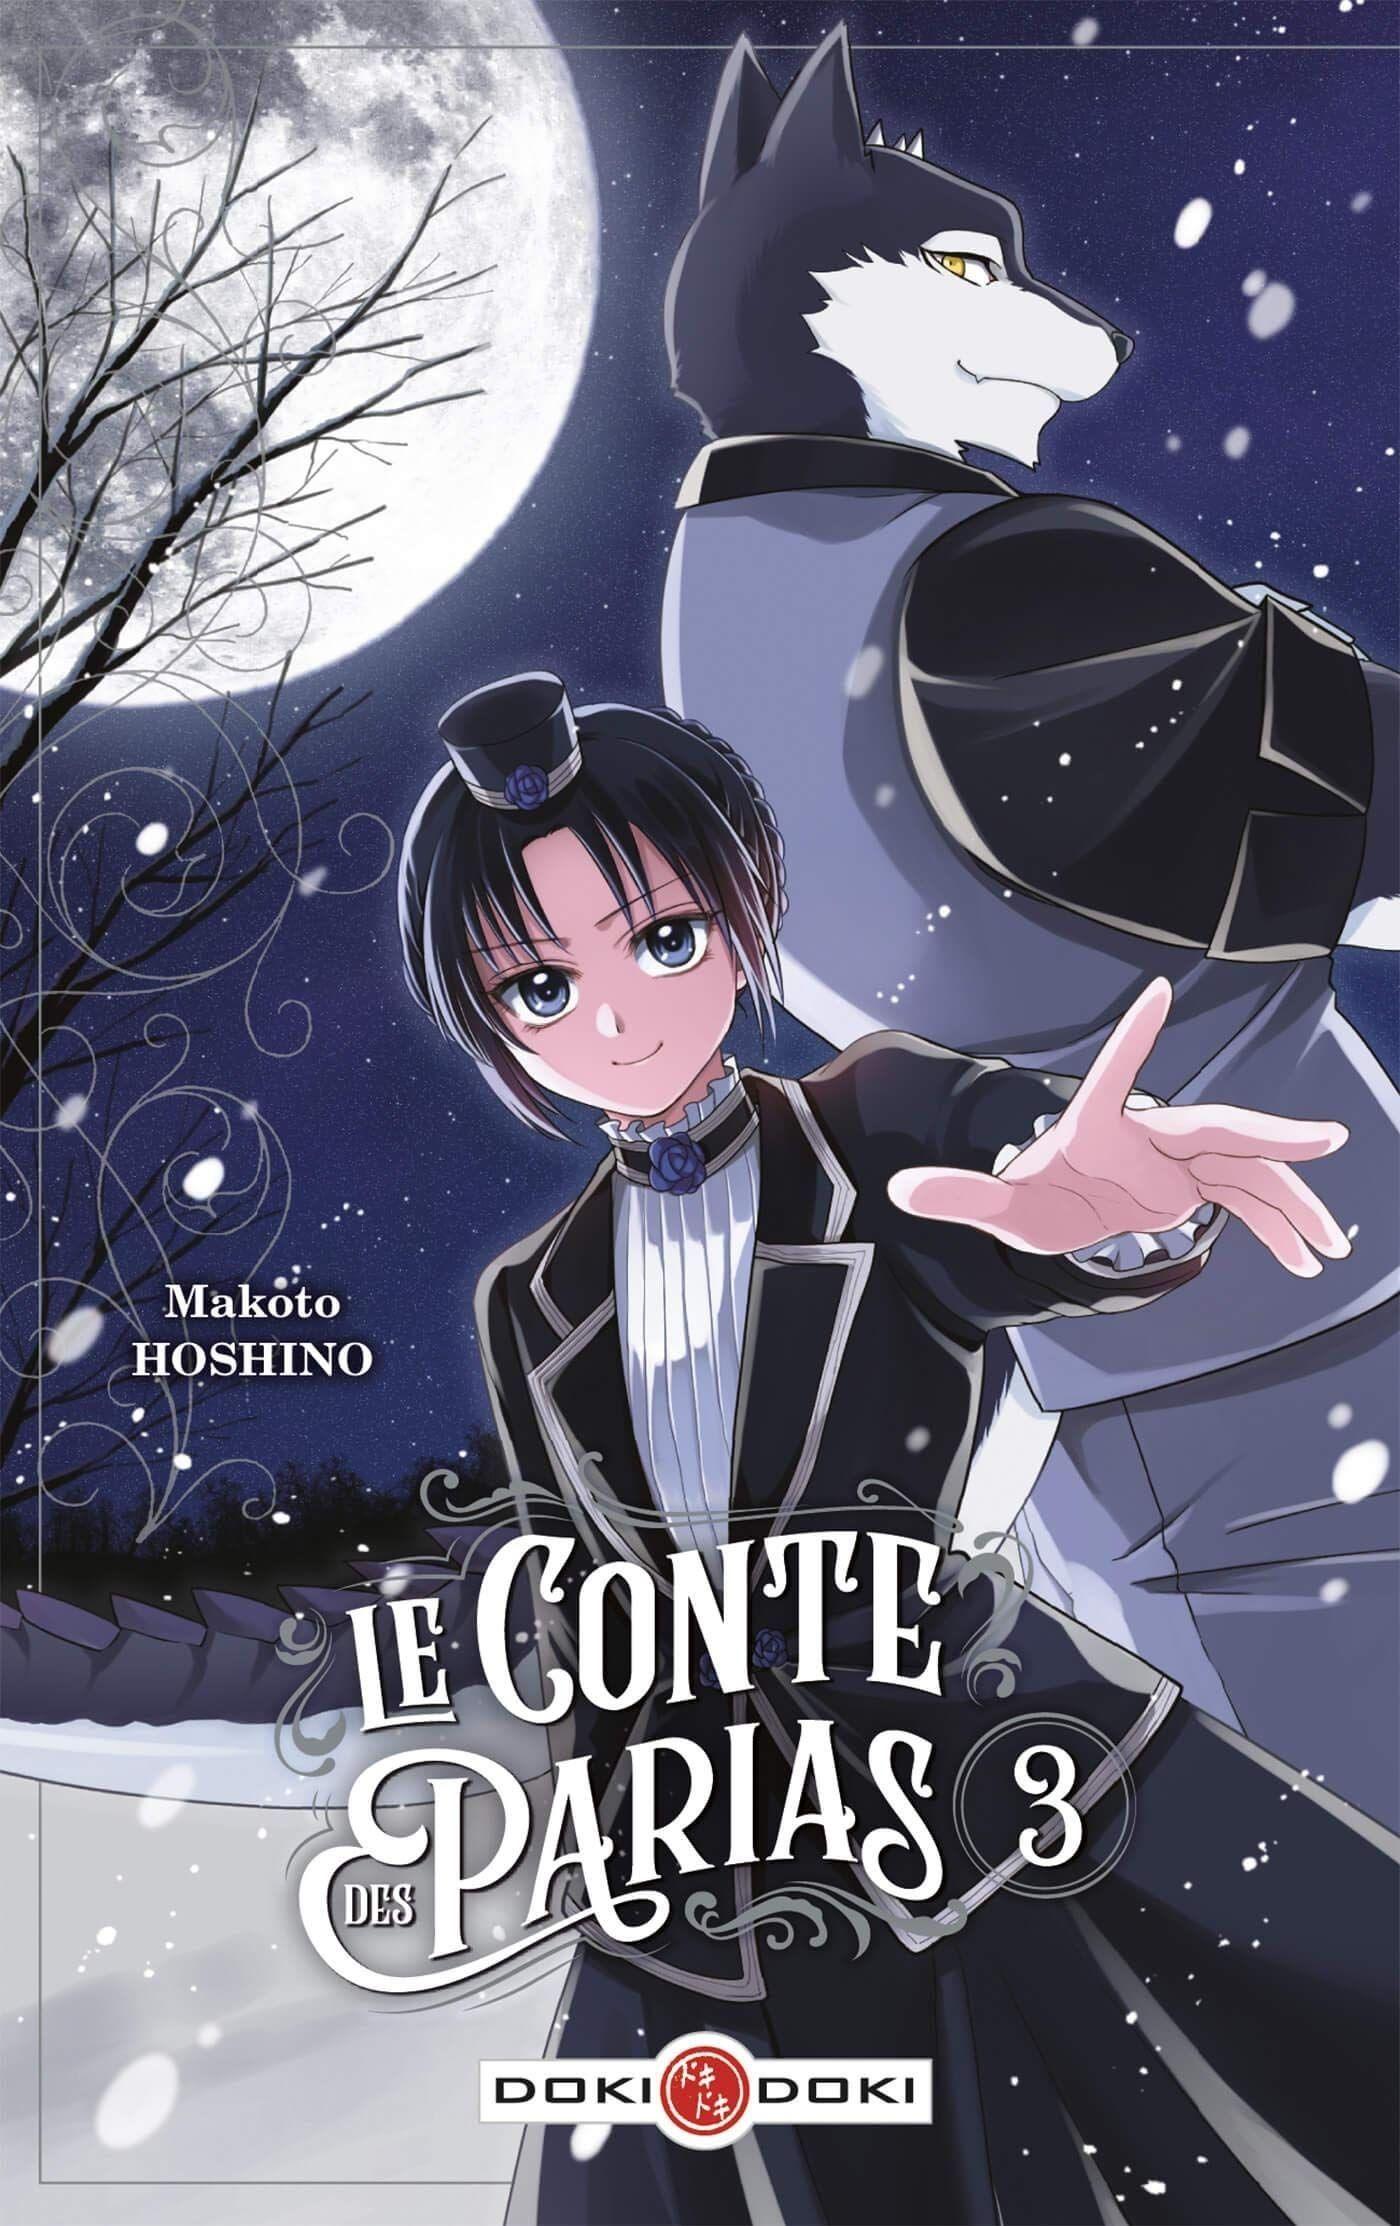 Sortie Manga au Québec JUIN 2021 Conte-des-parias-3-doki